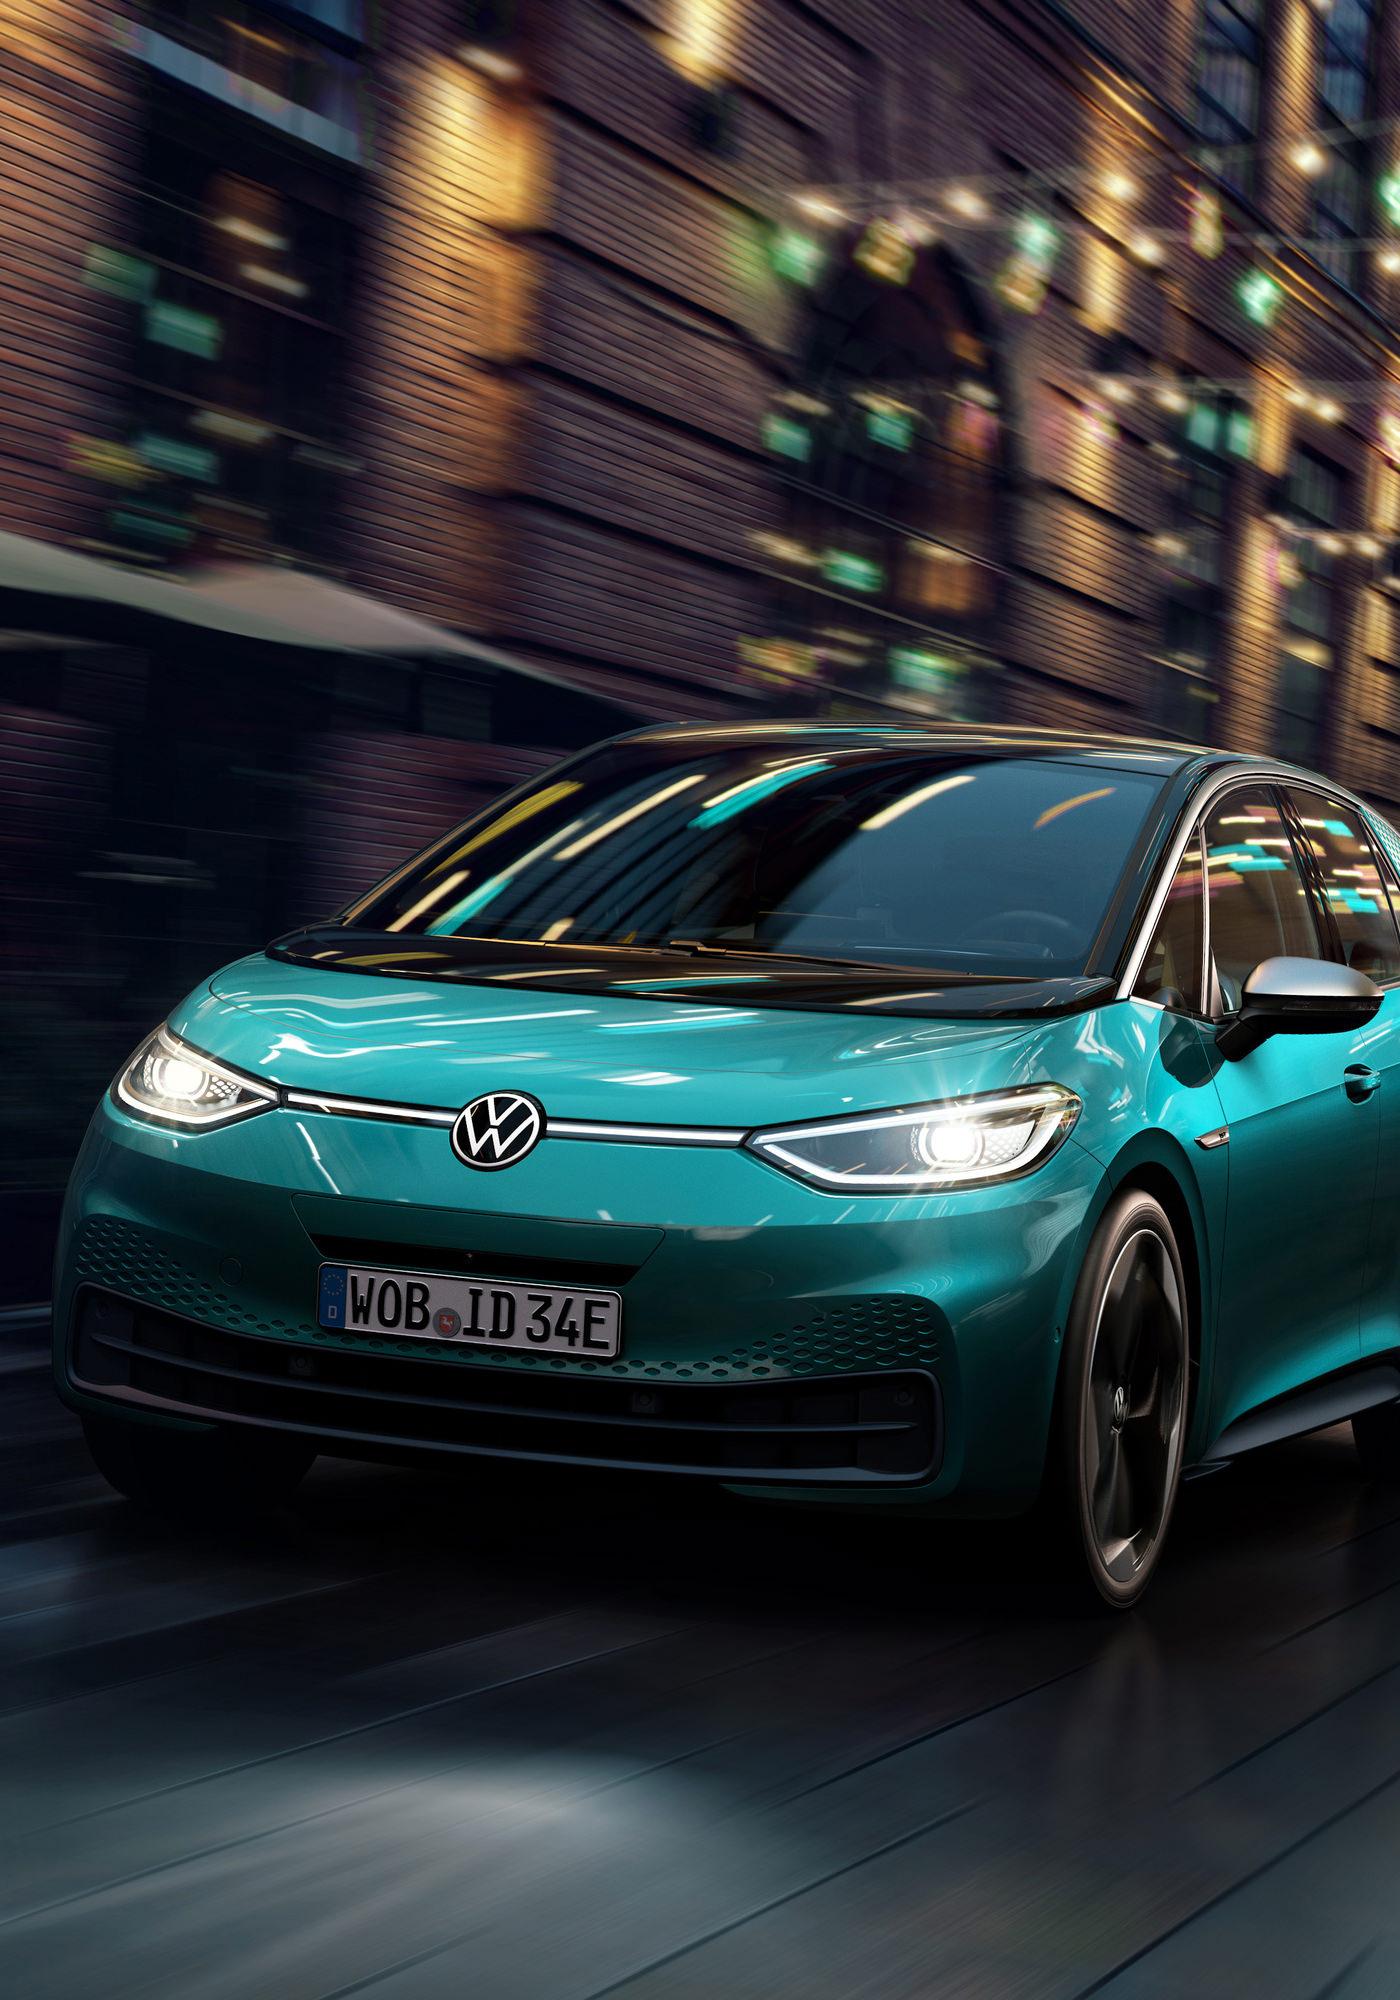 Volkswagen ID.3 Voiture Electrique Nocturne Avant